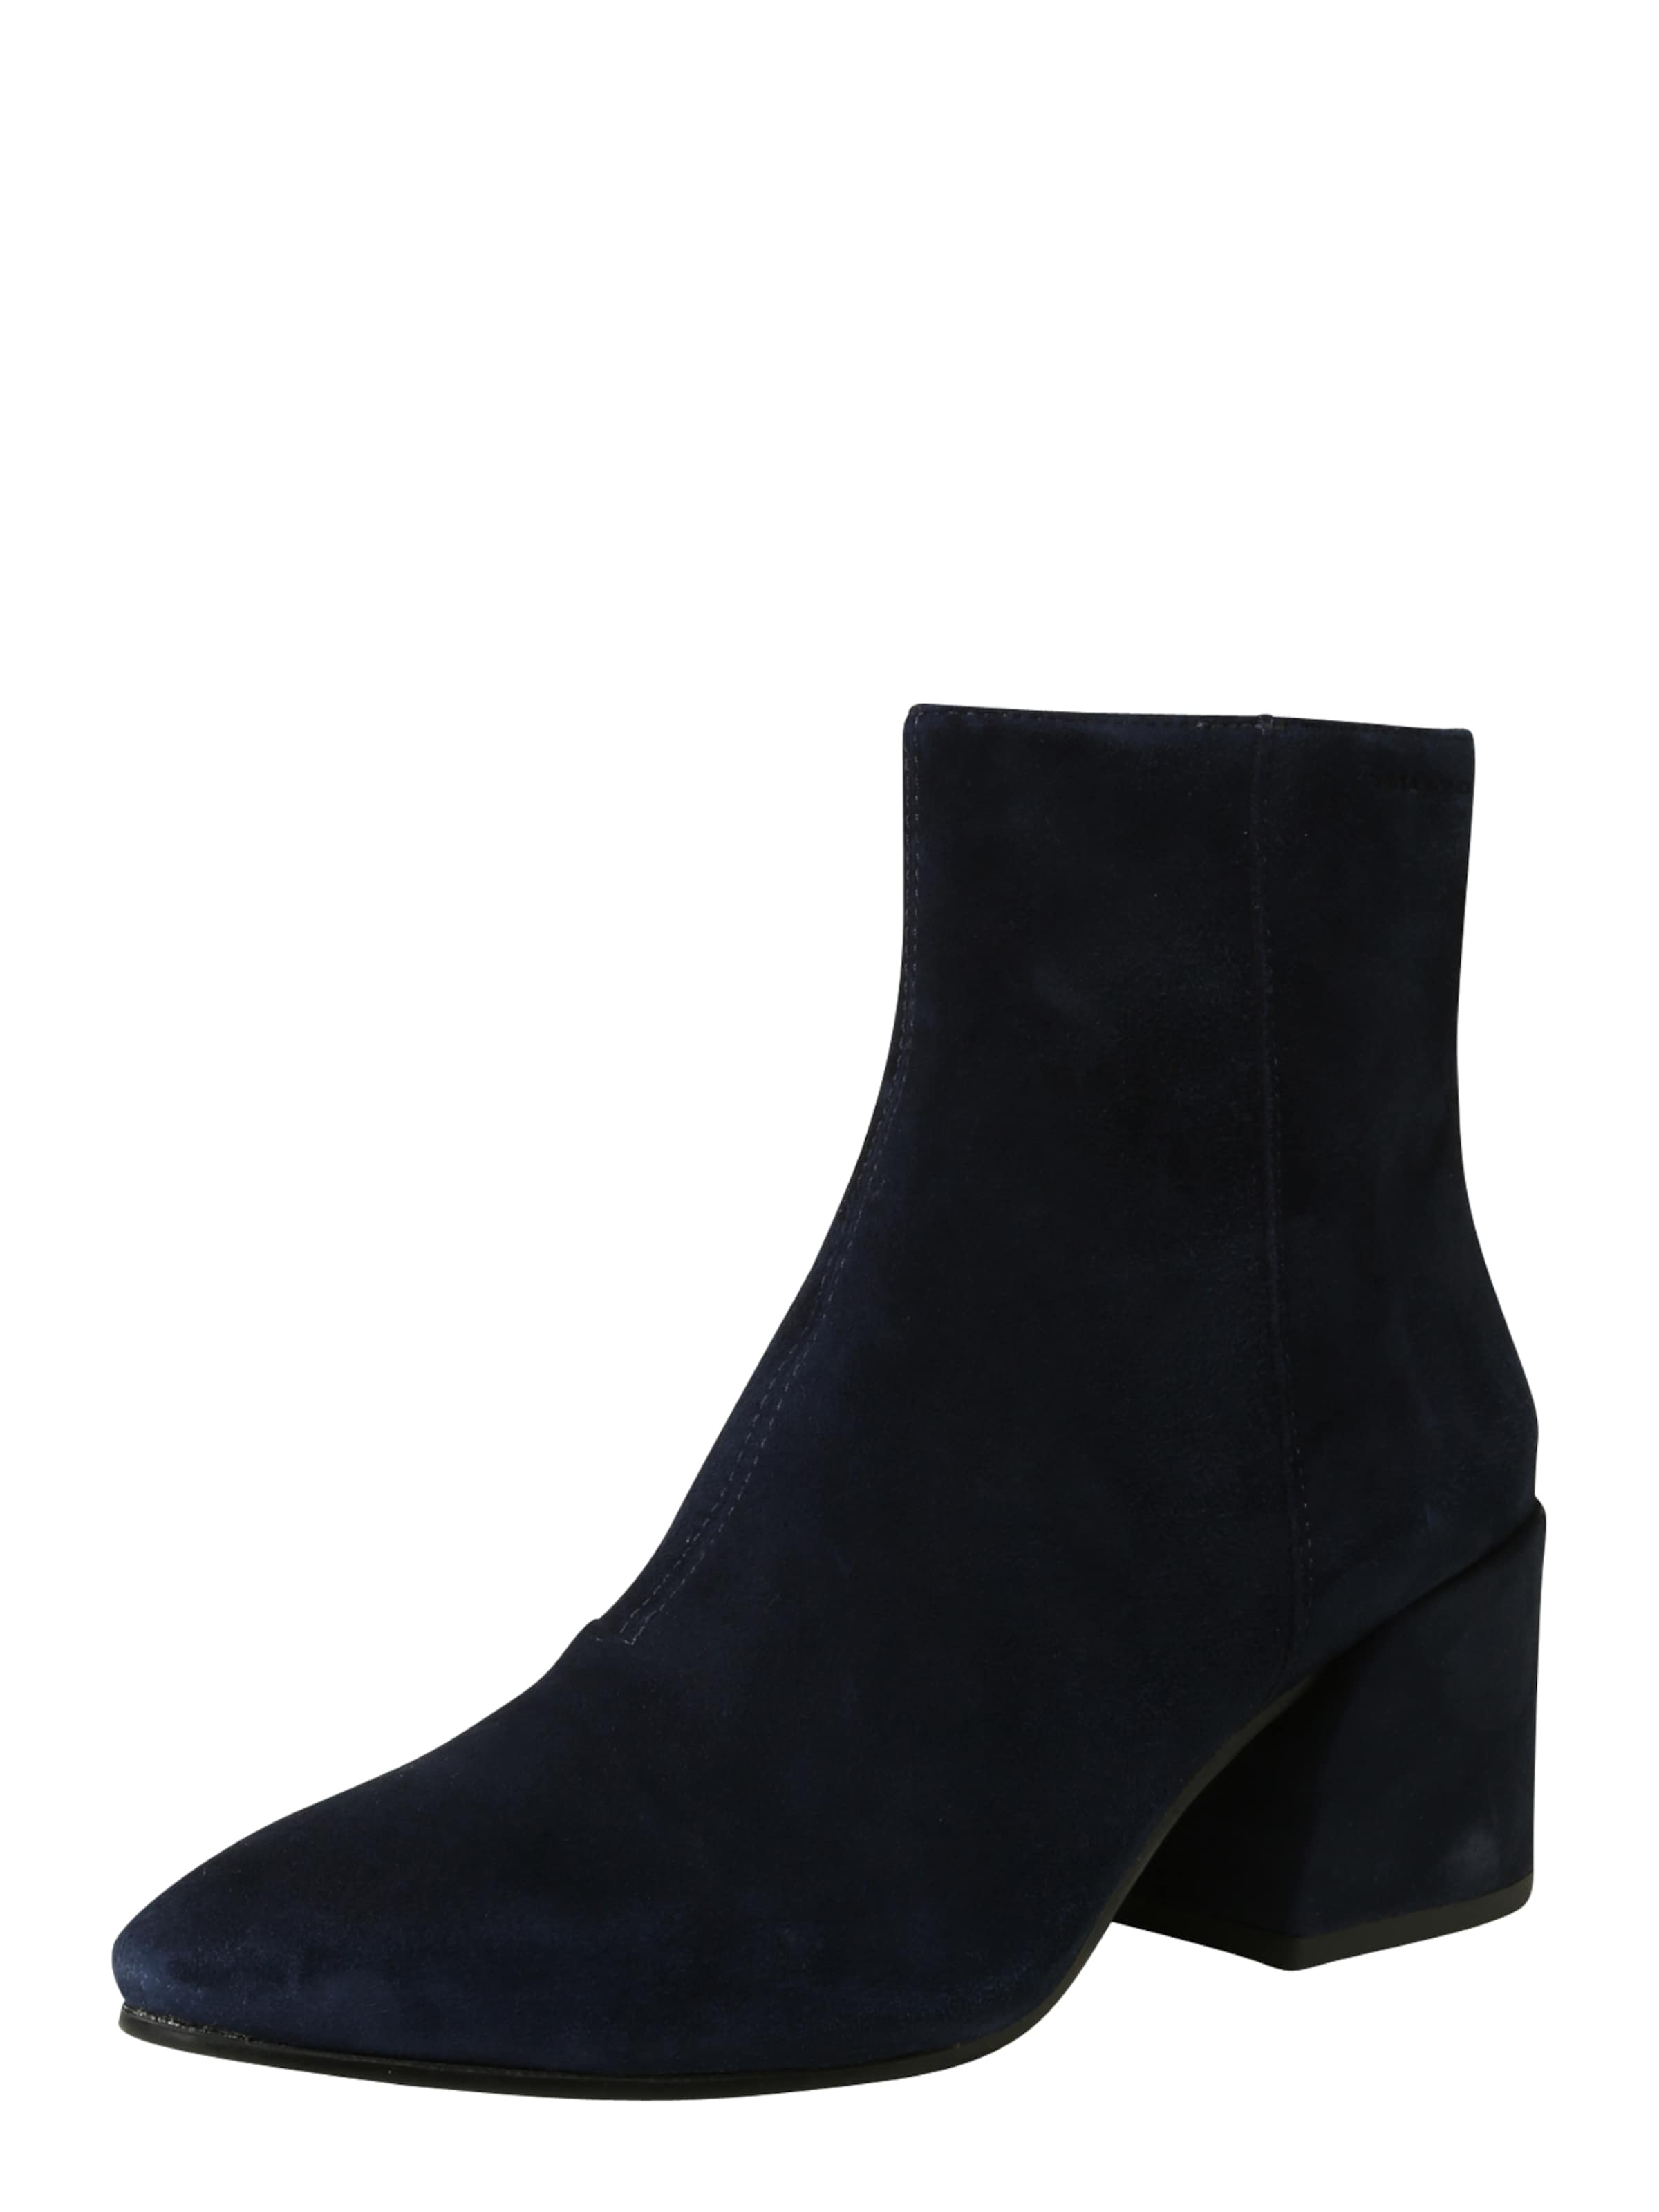 VAGABOND SHOEMAKERS | Ankle Boot  Olivia